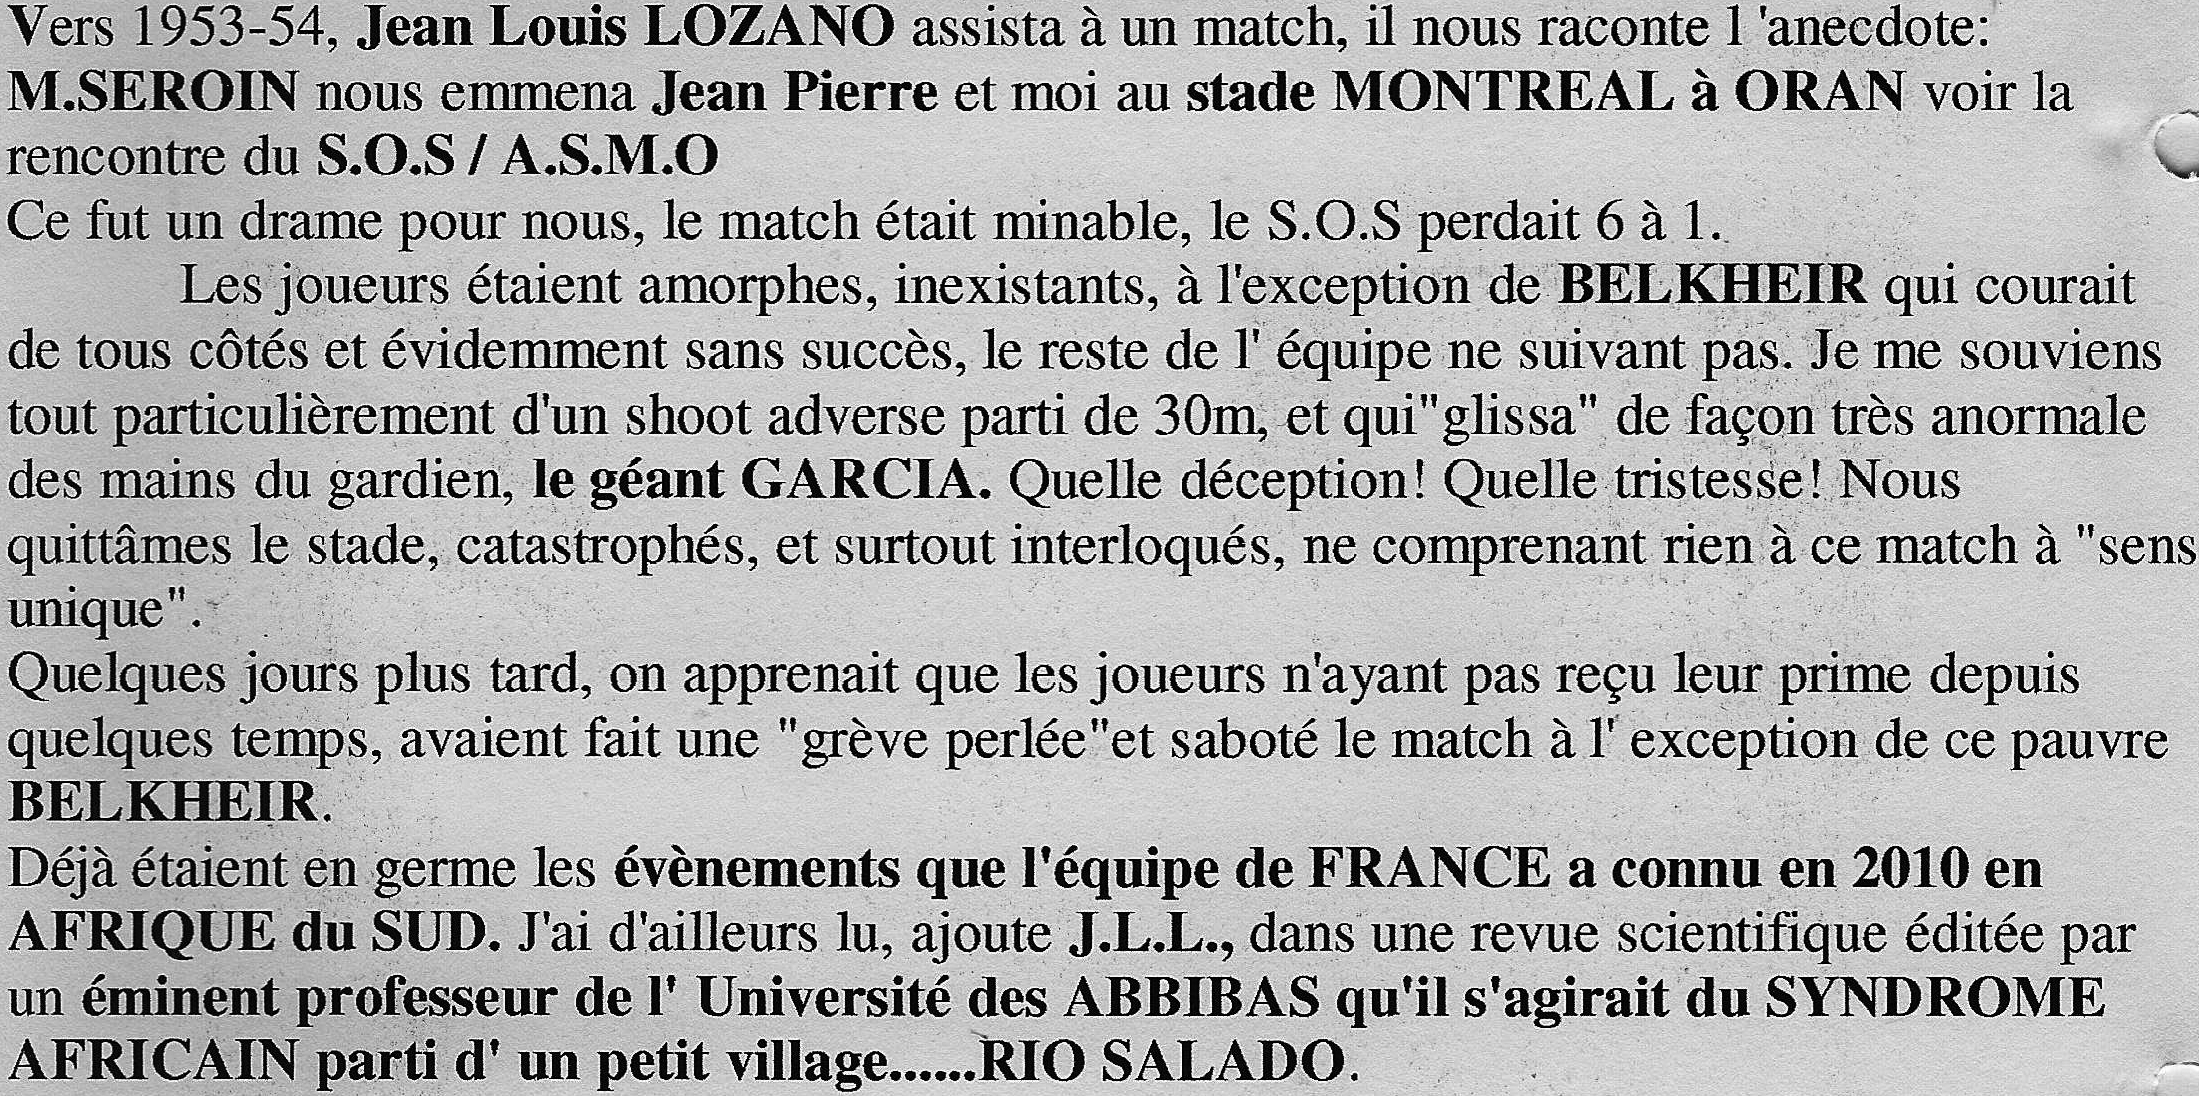 Anecdote Jean Louis LOZANO